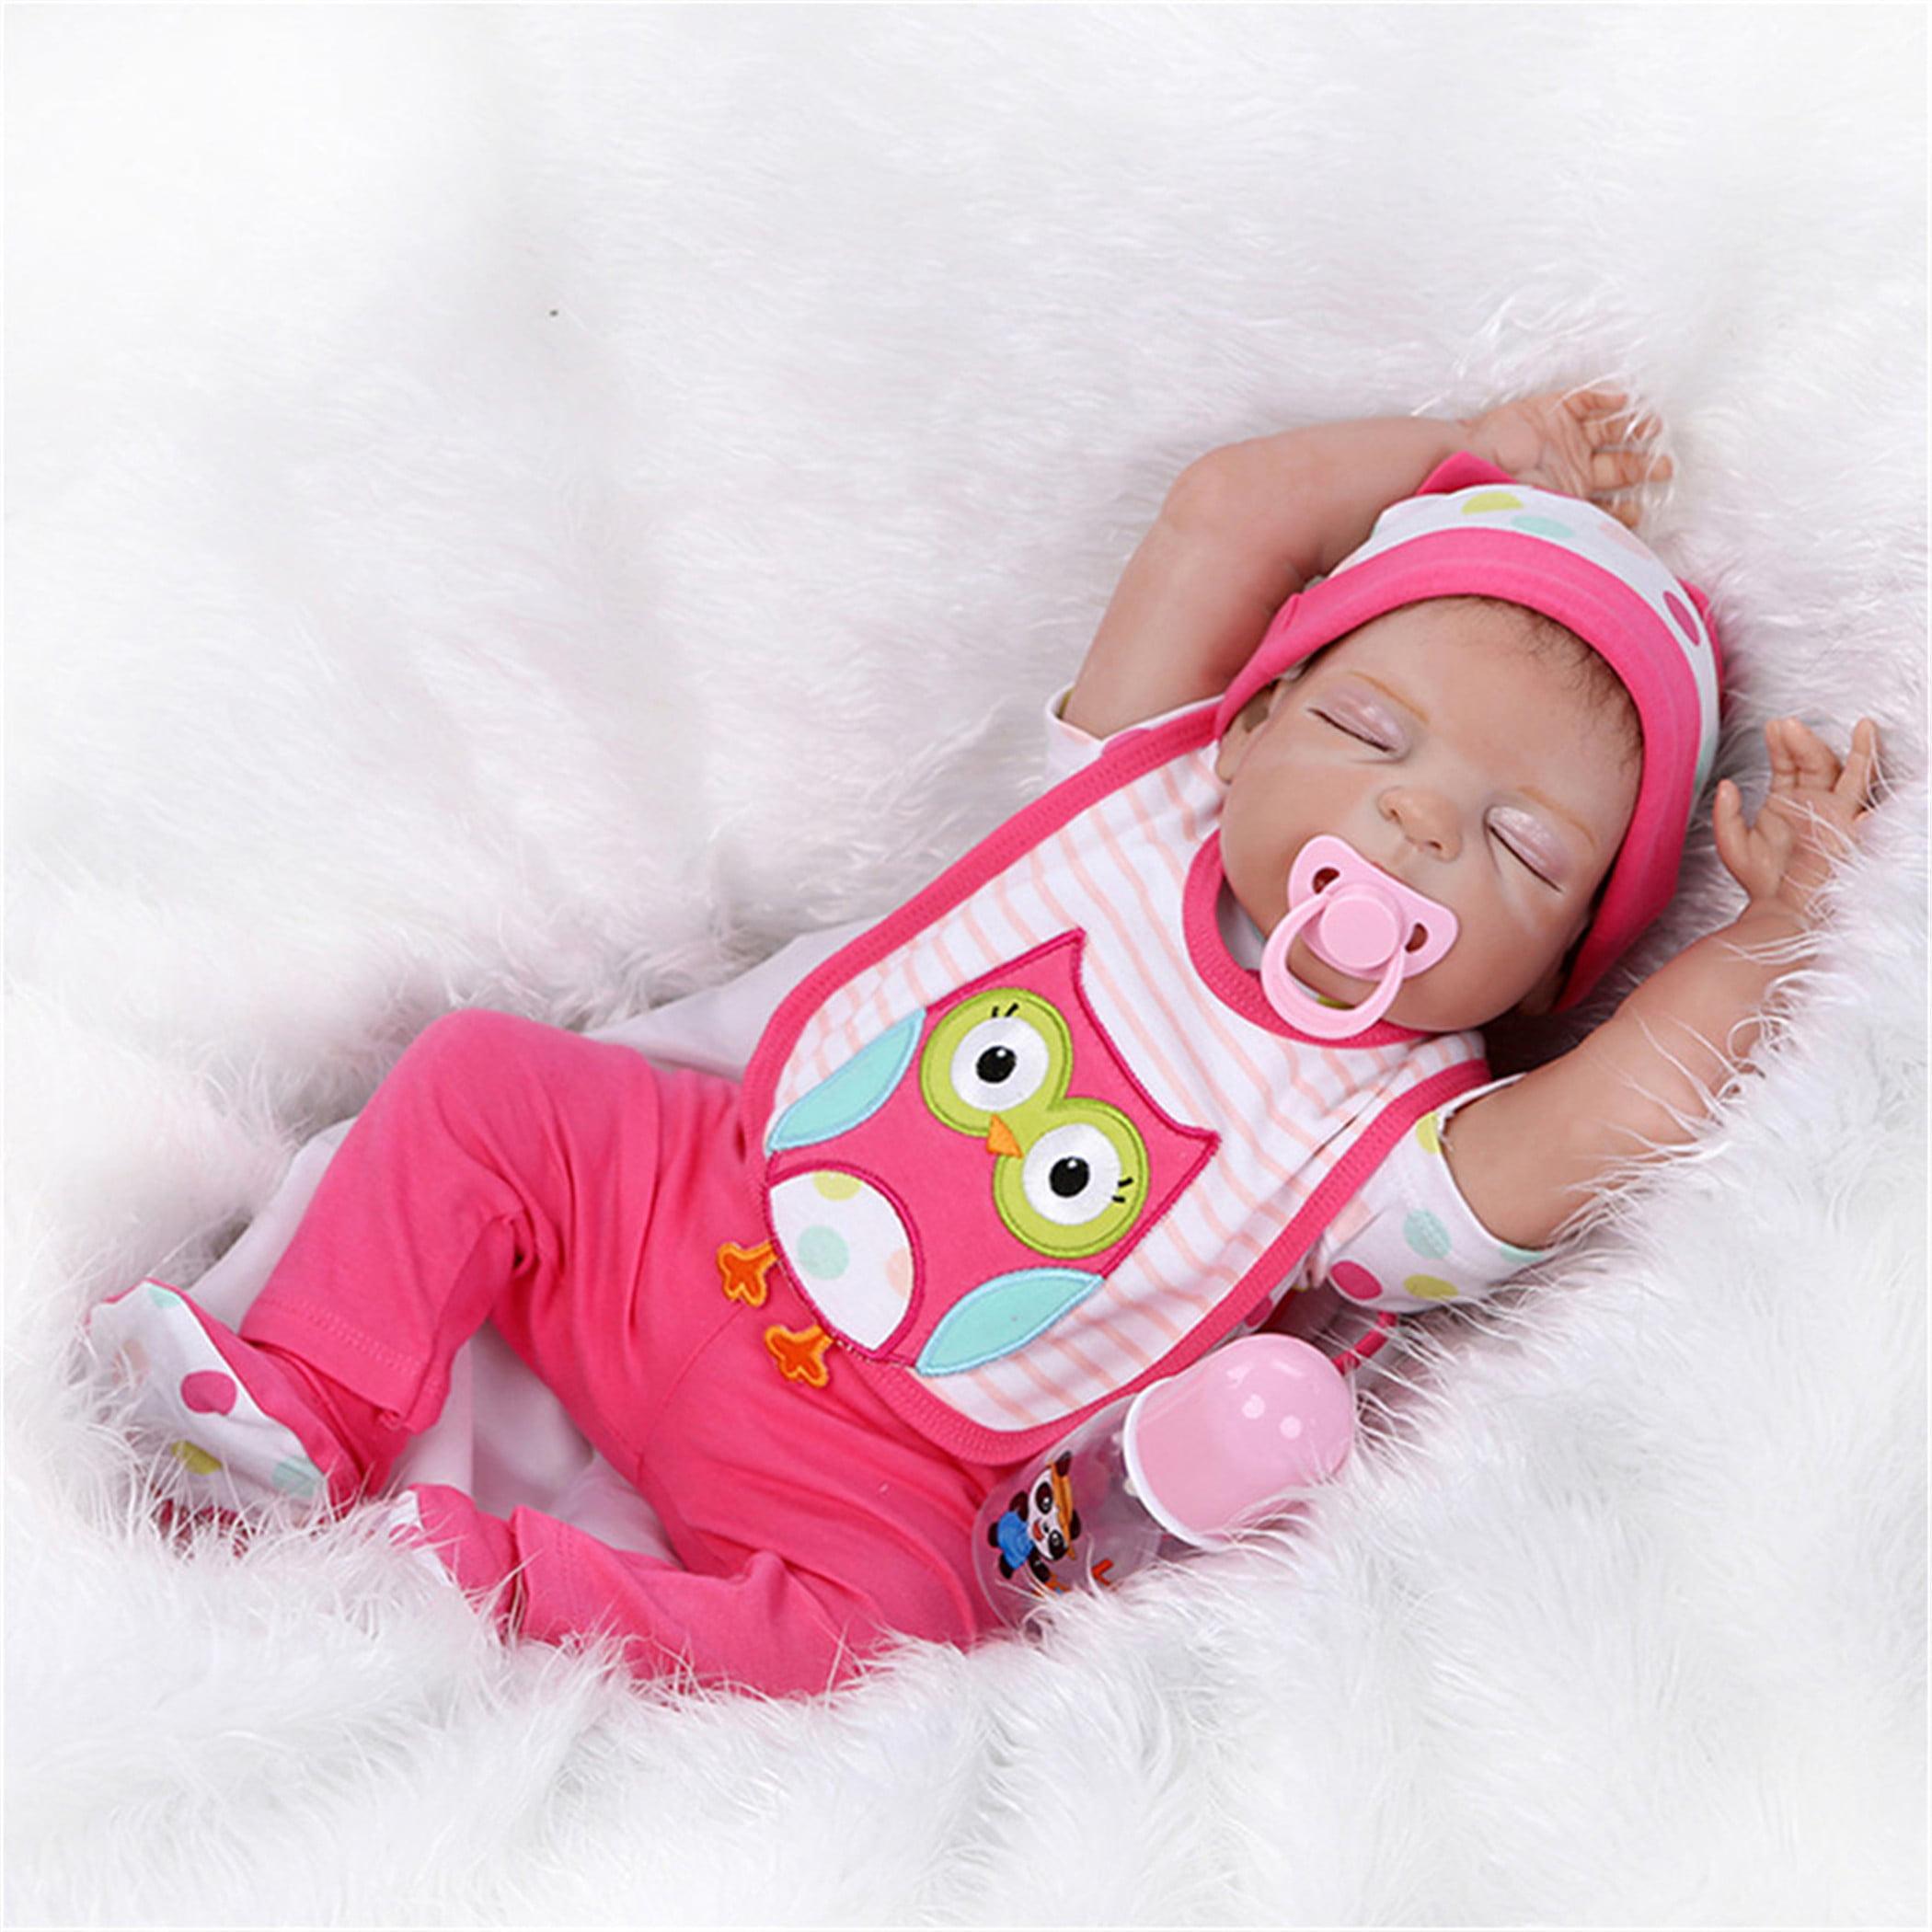 NPK Collection Reborn Baby Doll Soft Silicone vinyl 22inc...